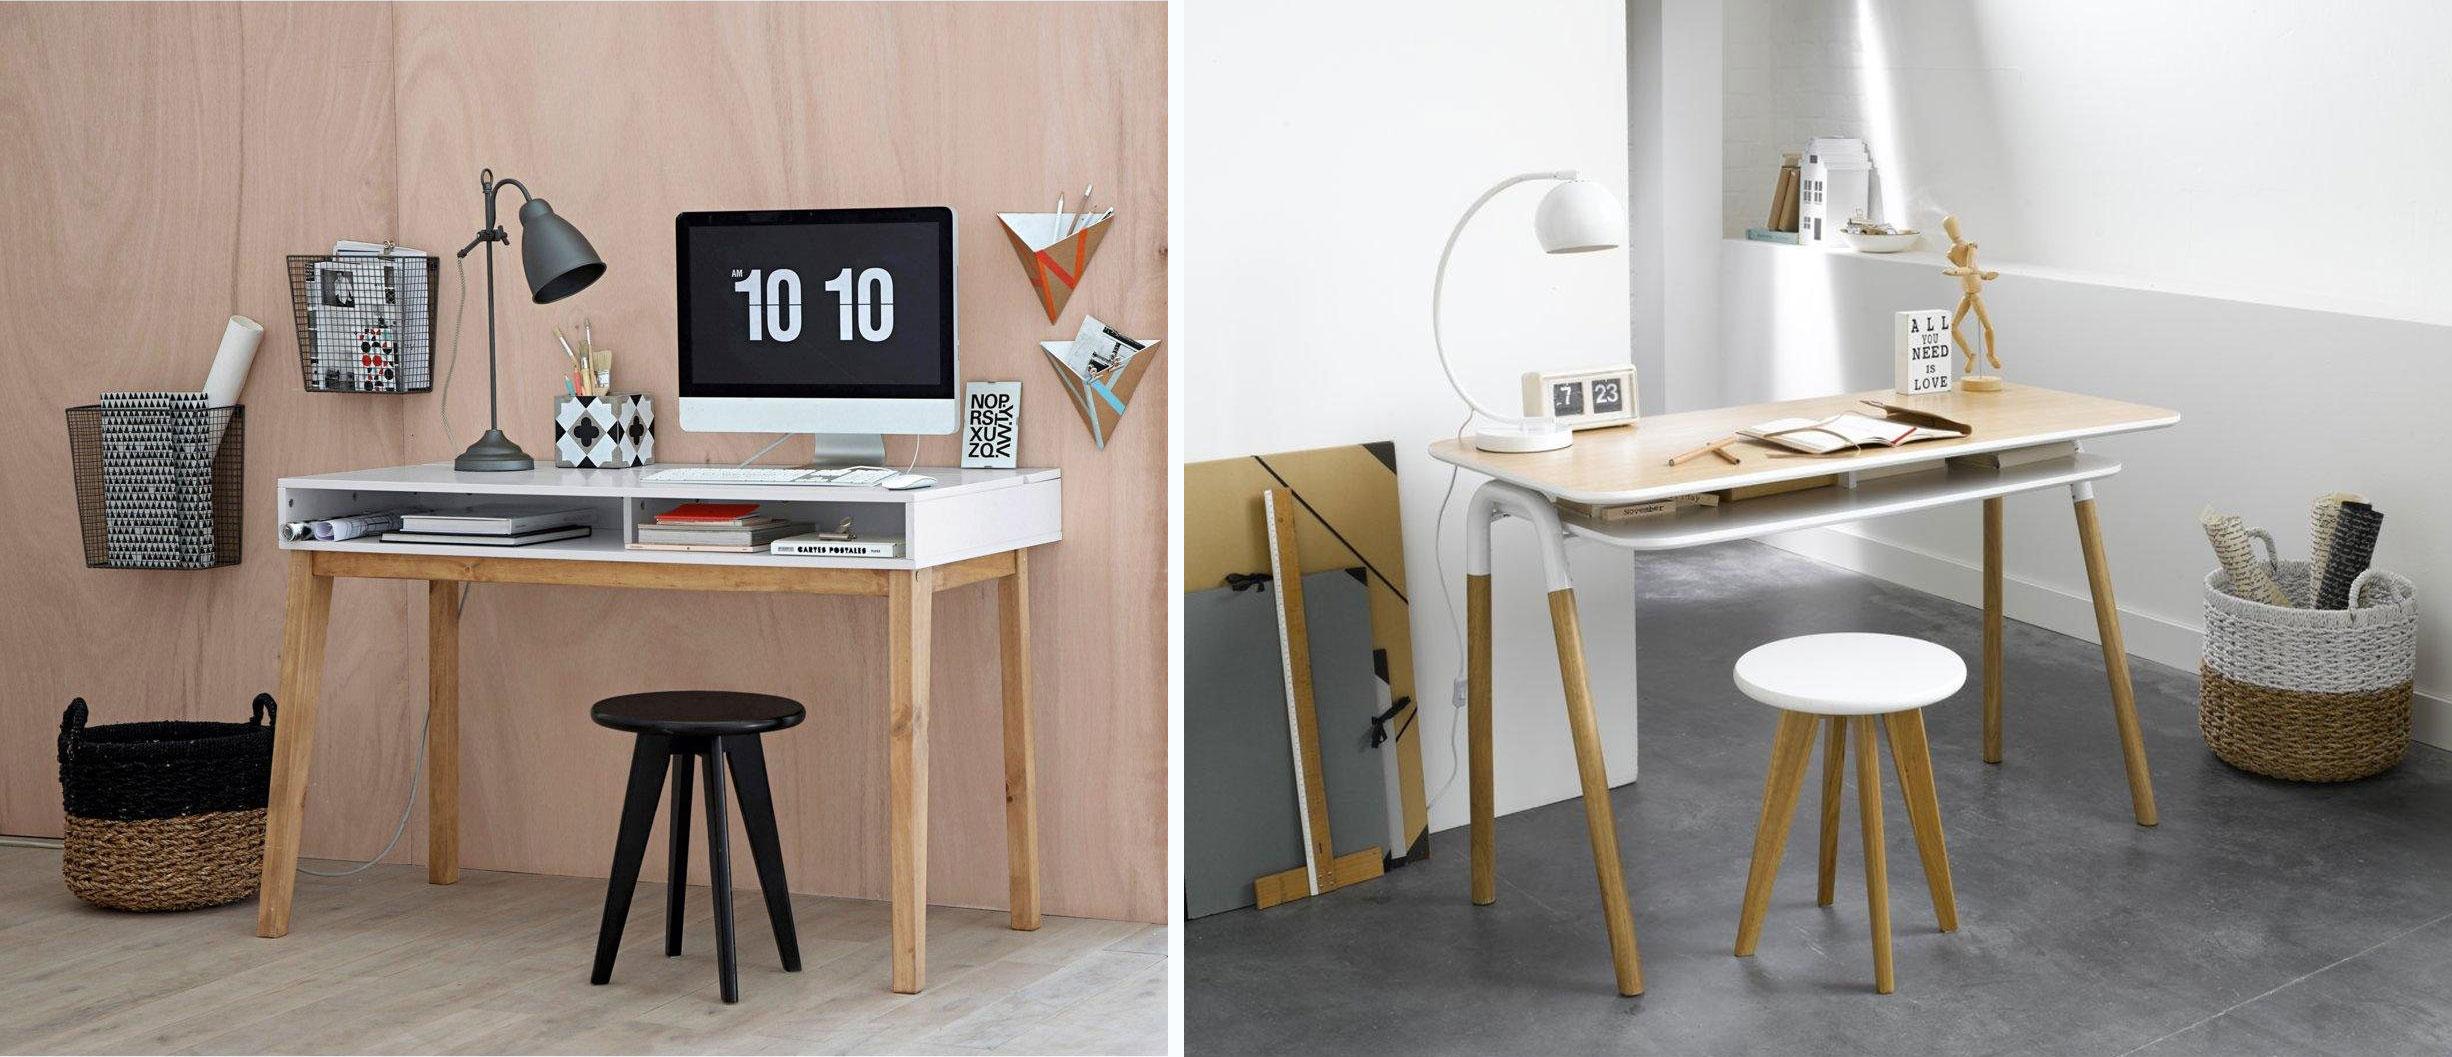 Bureau Design Deco Bois Blanc Style Scandinave La Redoute